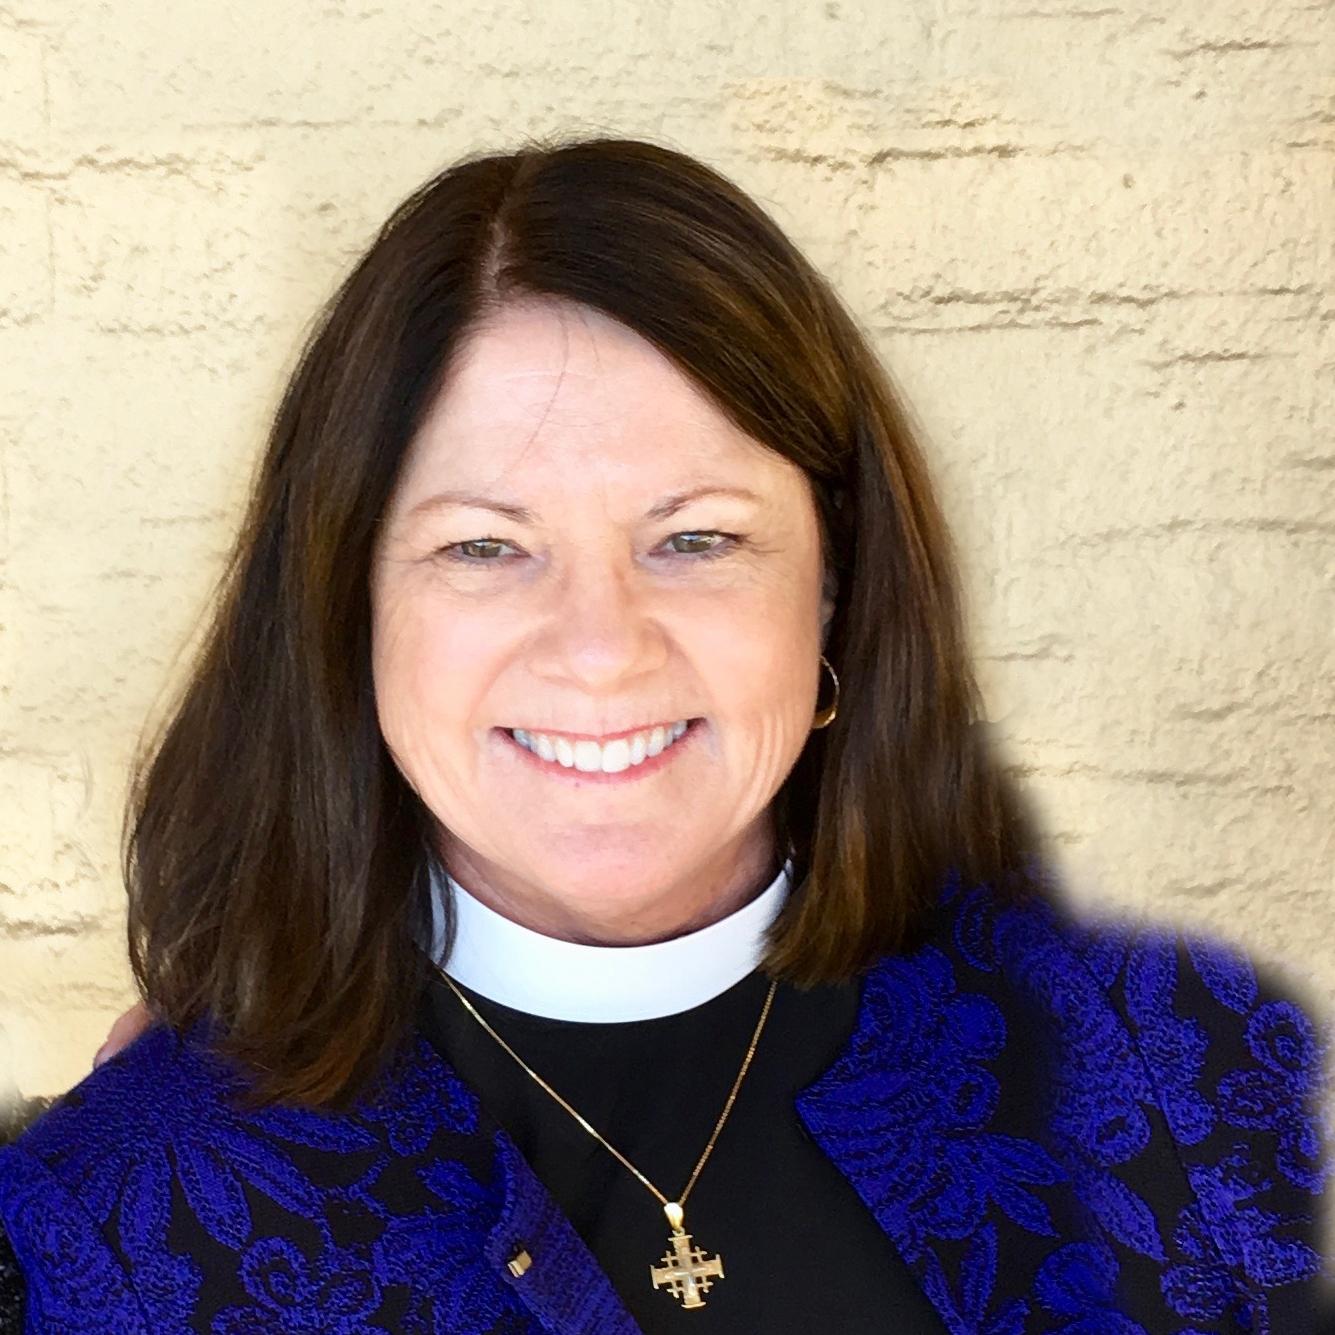 The Rev. Patti Angelo